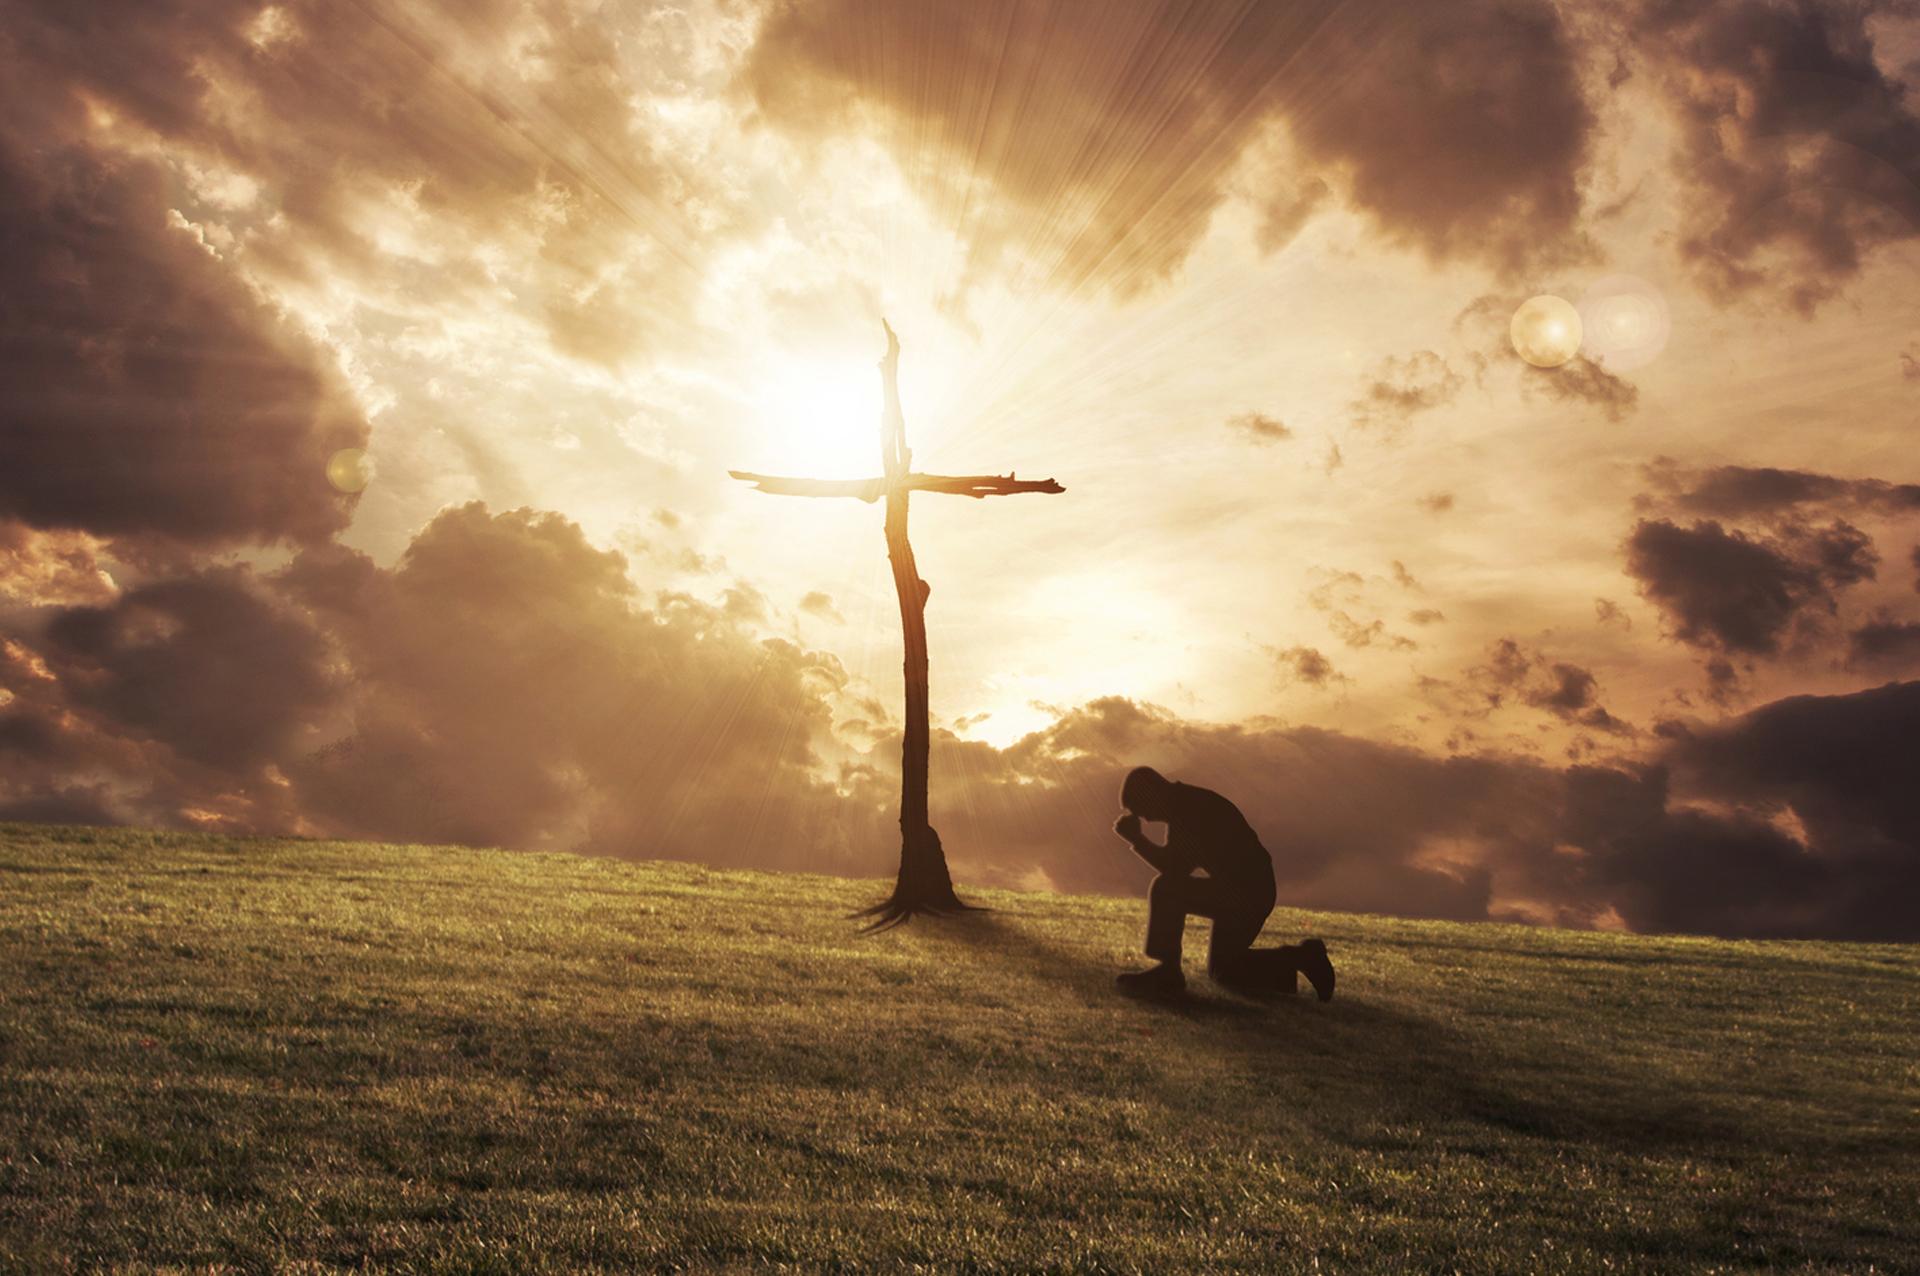 https://www.obfbc.org/wp-content/uploads/2019/01/repent.jpg